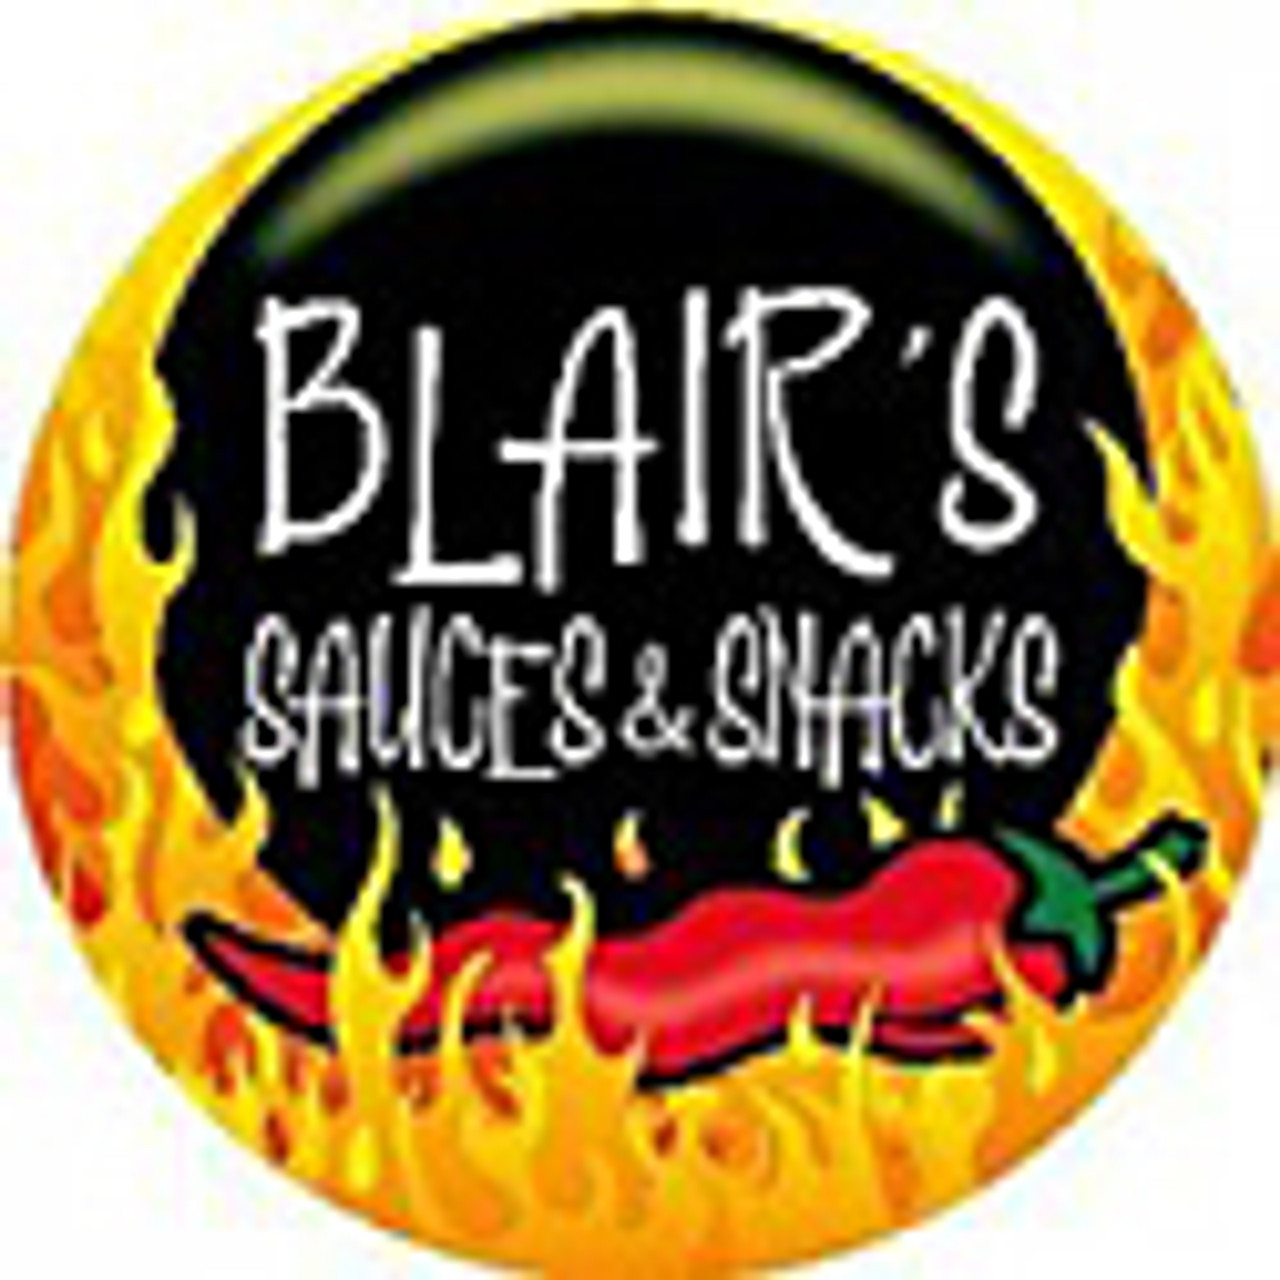 Blair's Sauces & Snacks